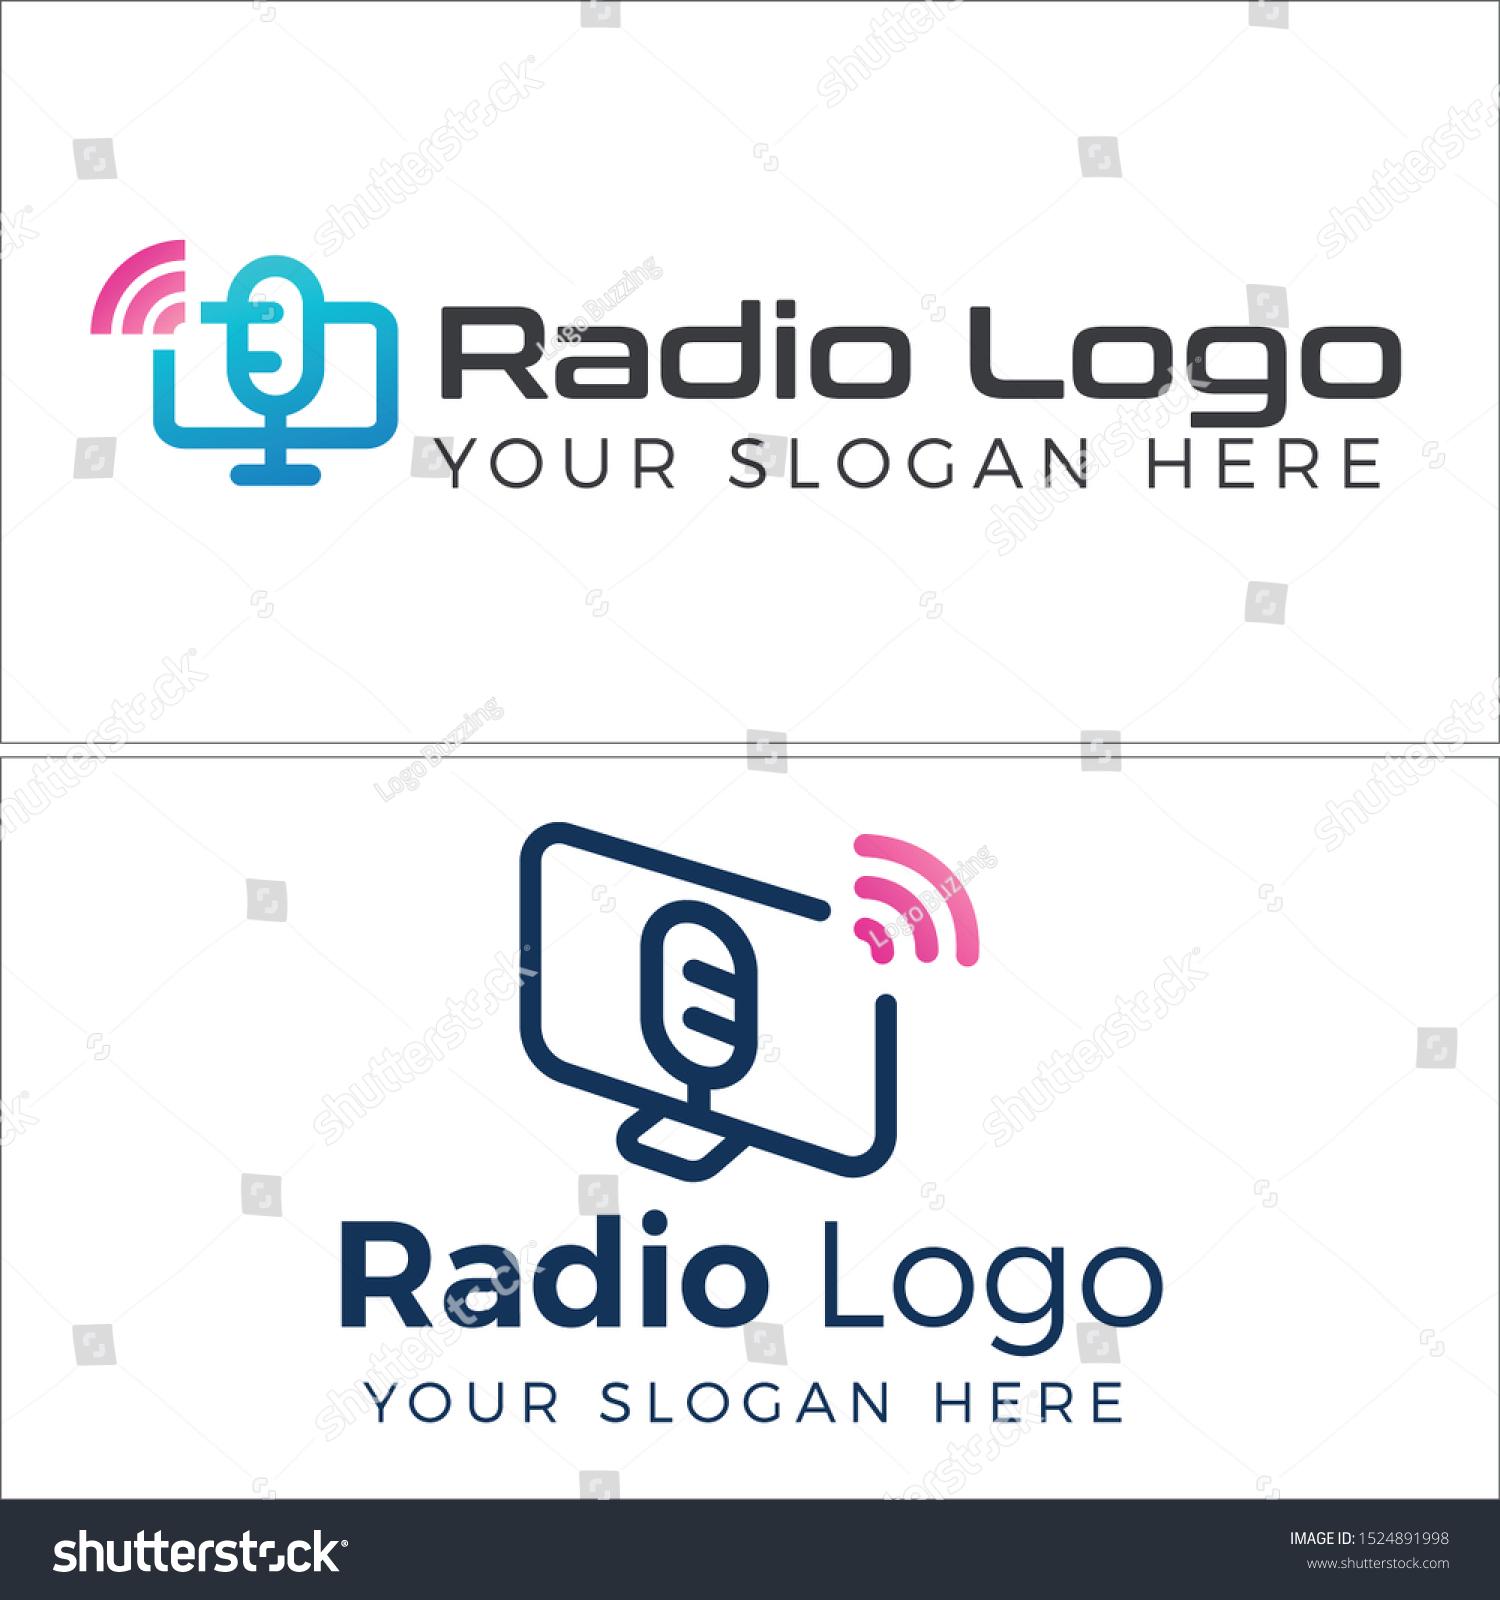 Radio Logo Microphone Monitor Blue Signal Stock Vector Royalty Free 1524891998